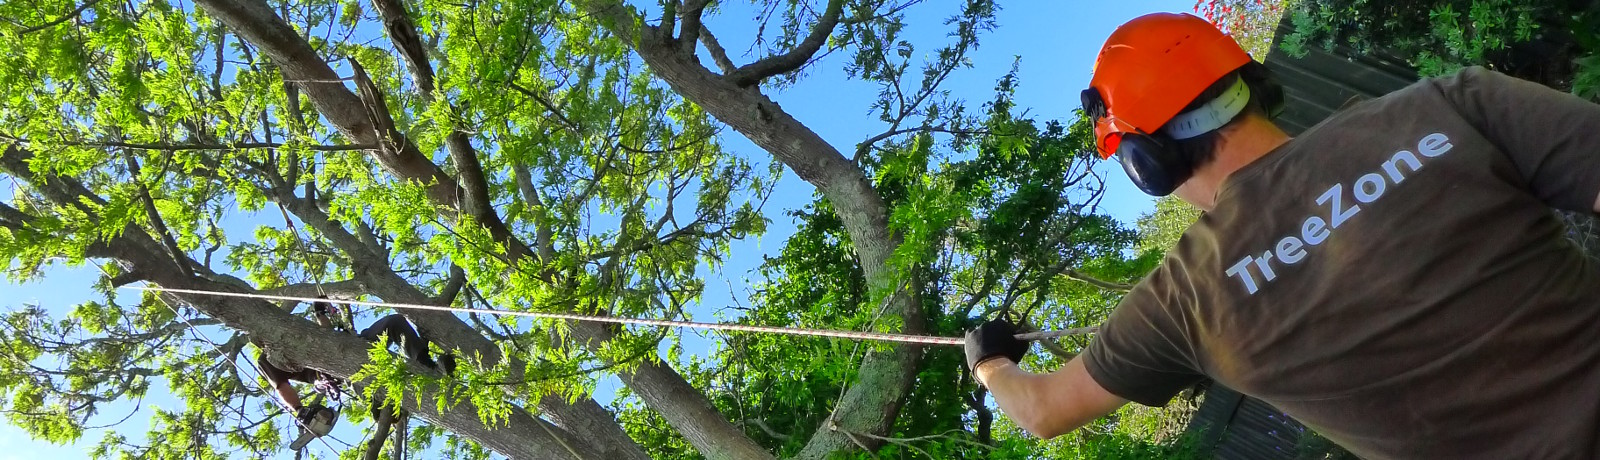 TreeZone North Shore Arborist